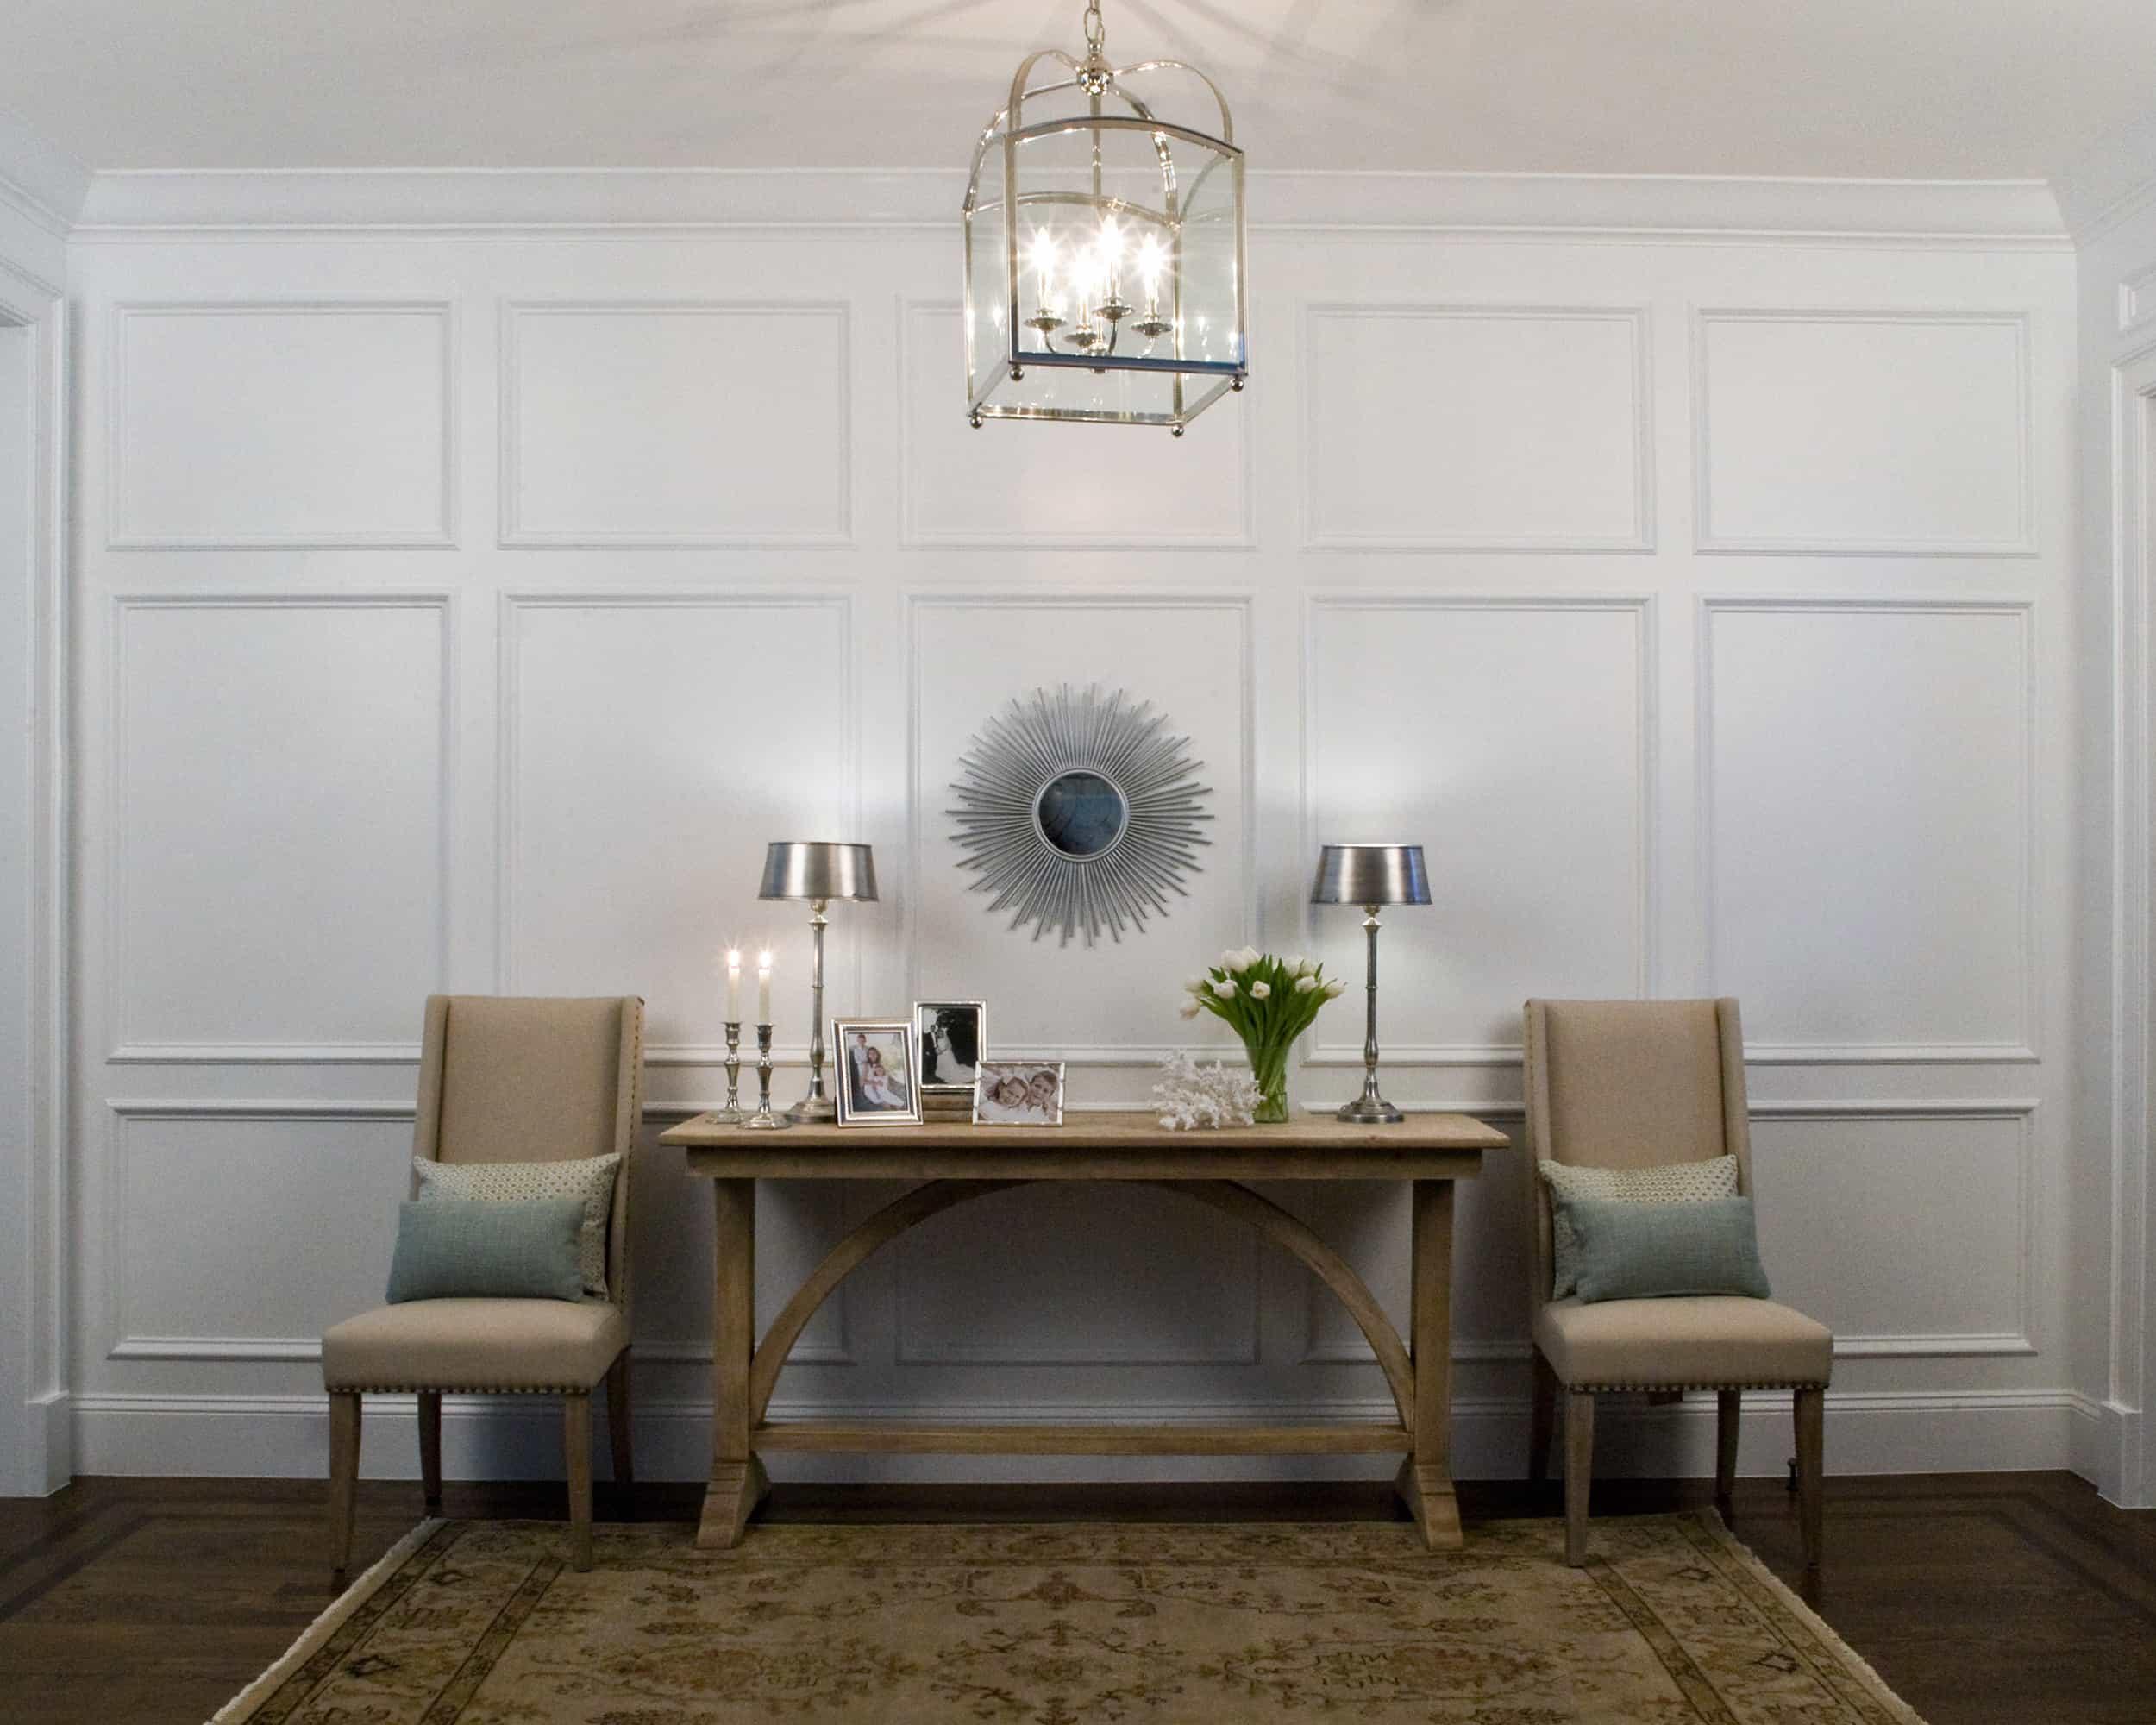 Foyer Interior Design : Studio m interior design is a full service